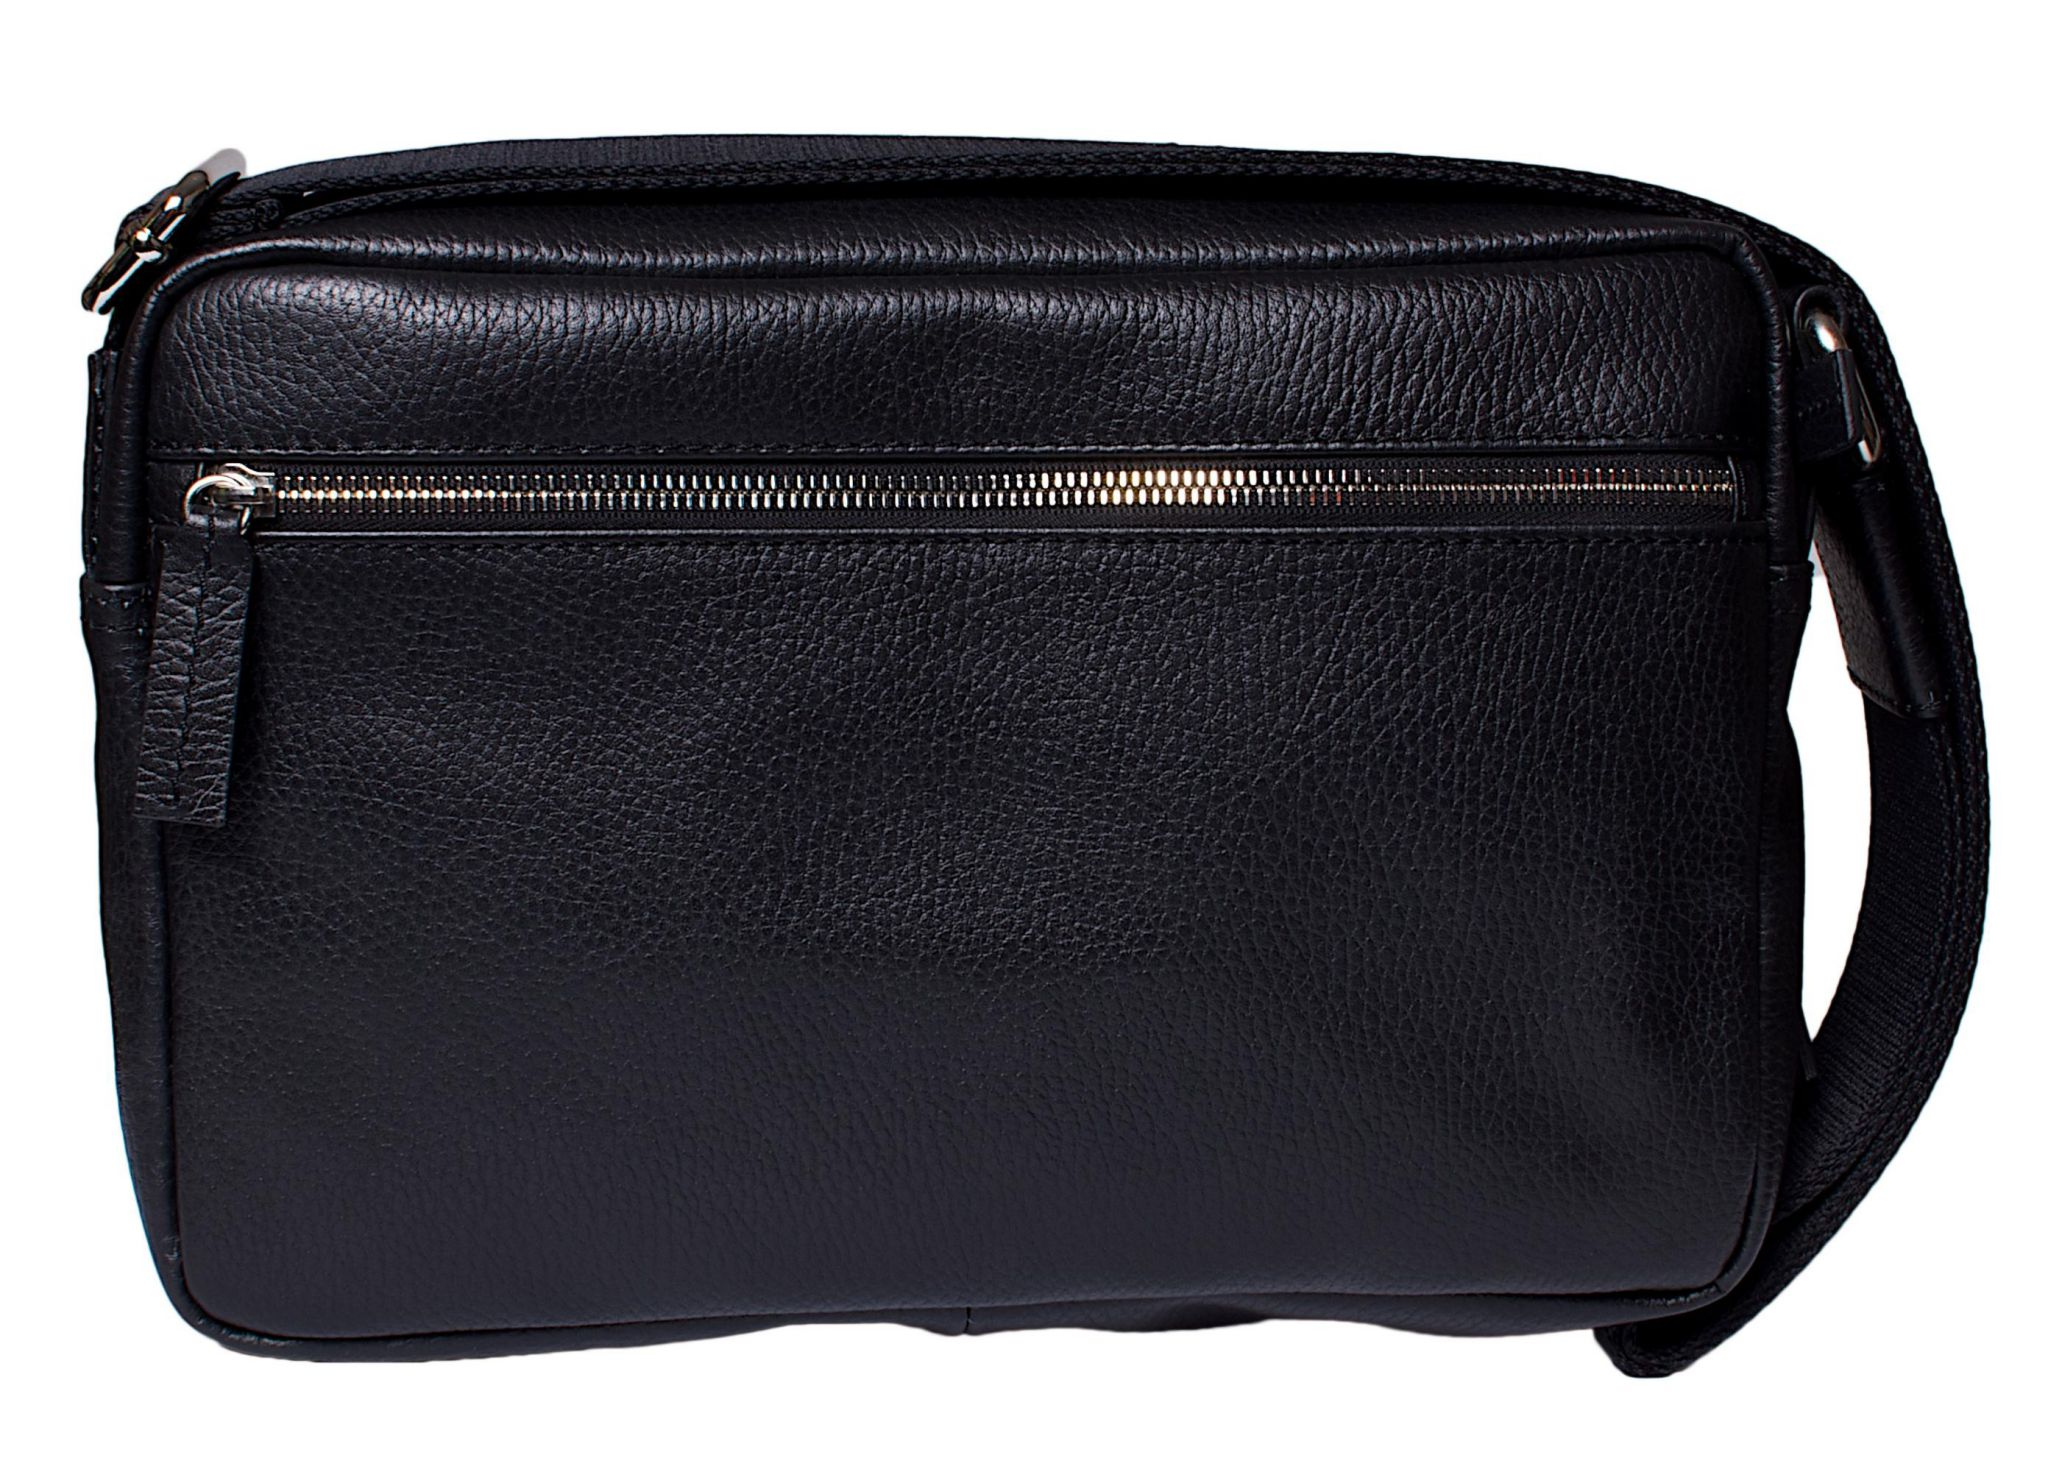 Small black shoulder bag - Bags - E-shop | alaindelon.co.uk